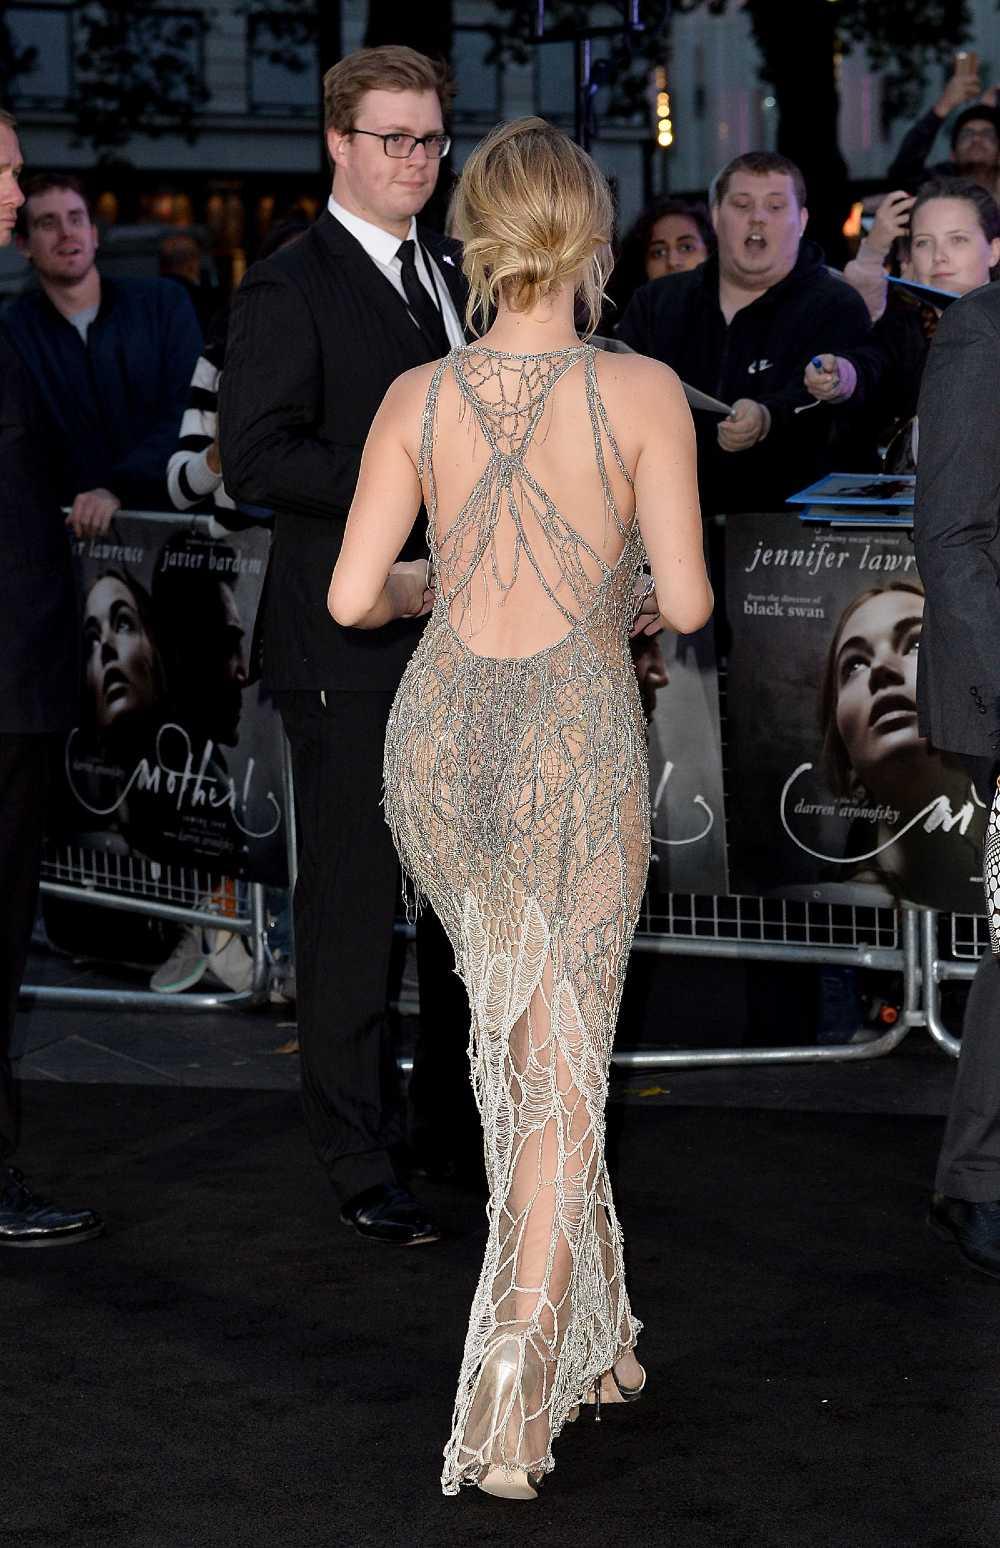 Jennifer Lawrence hot back